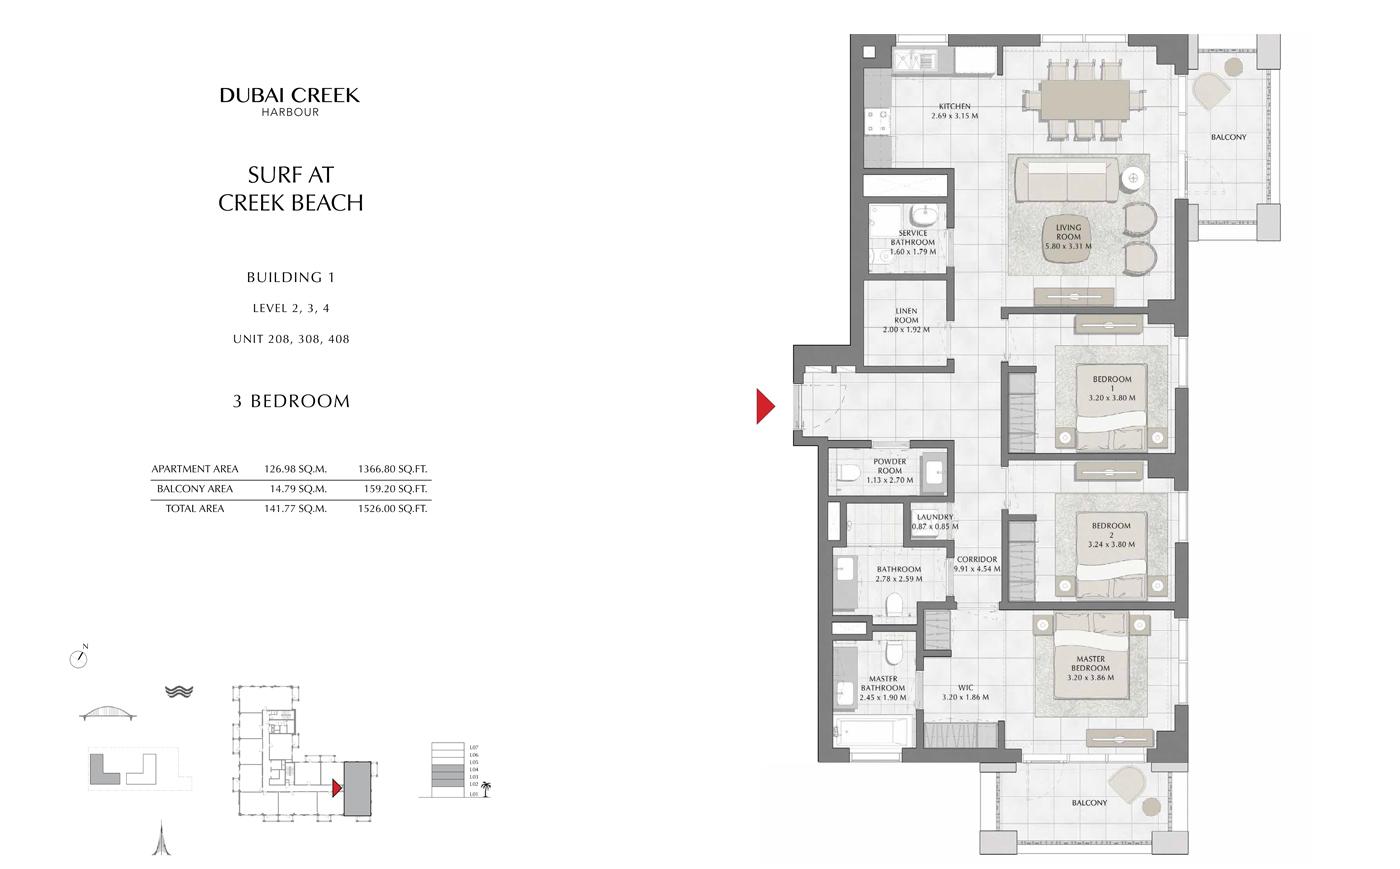 Building 1, 3 Bedroom, Level 2, 3, 4, Size 1526 Sq Ft